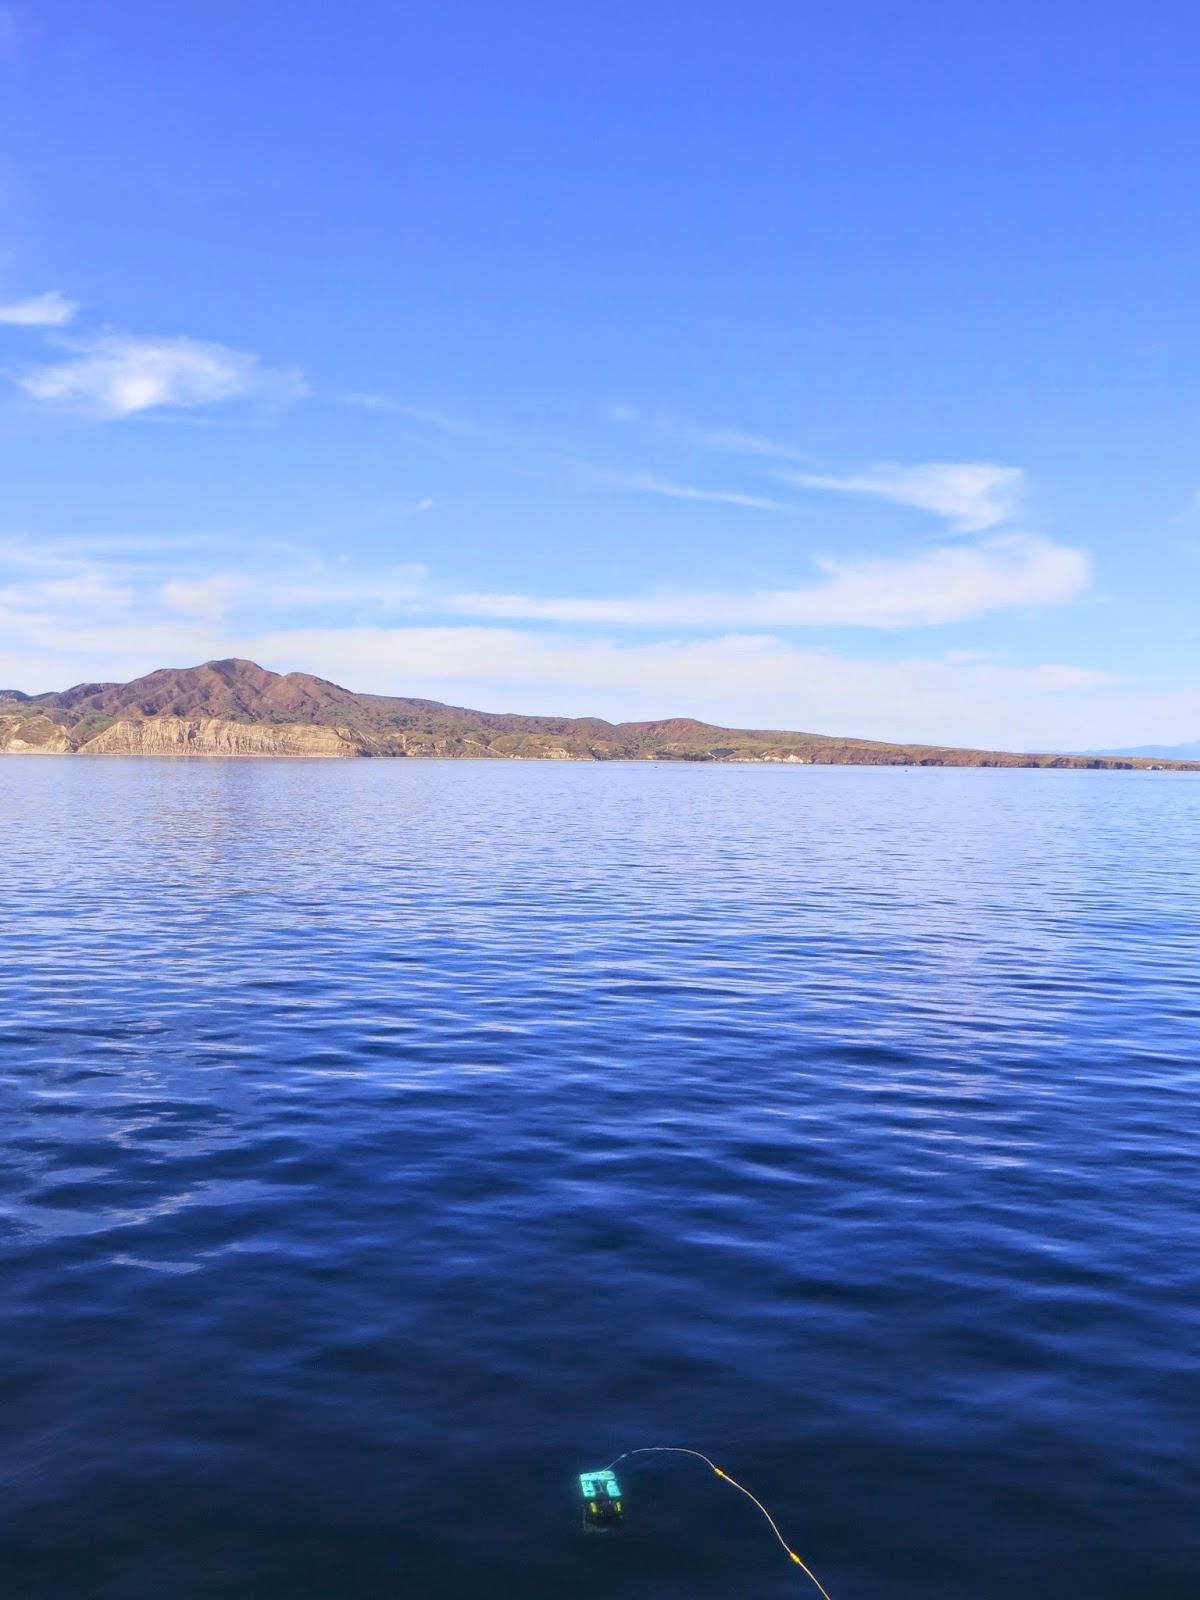 Santa Cruz Island and the ROV